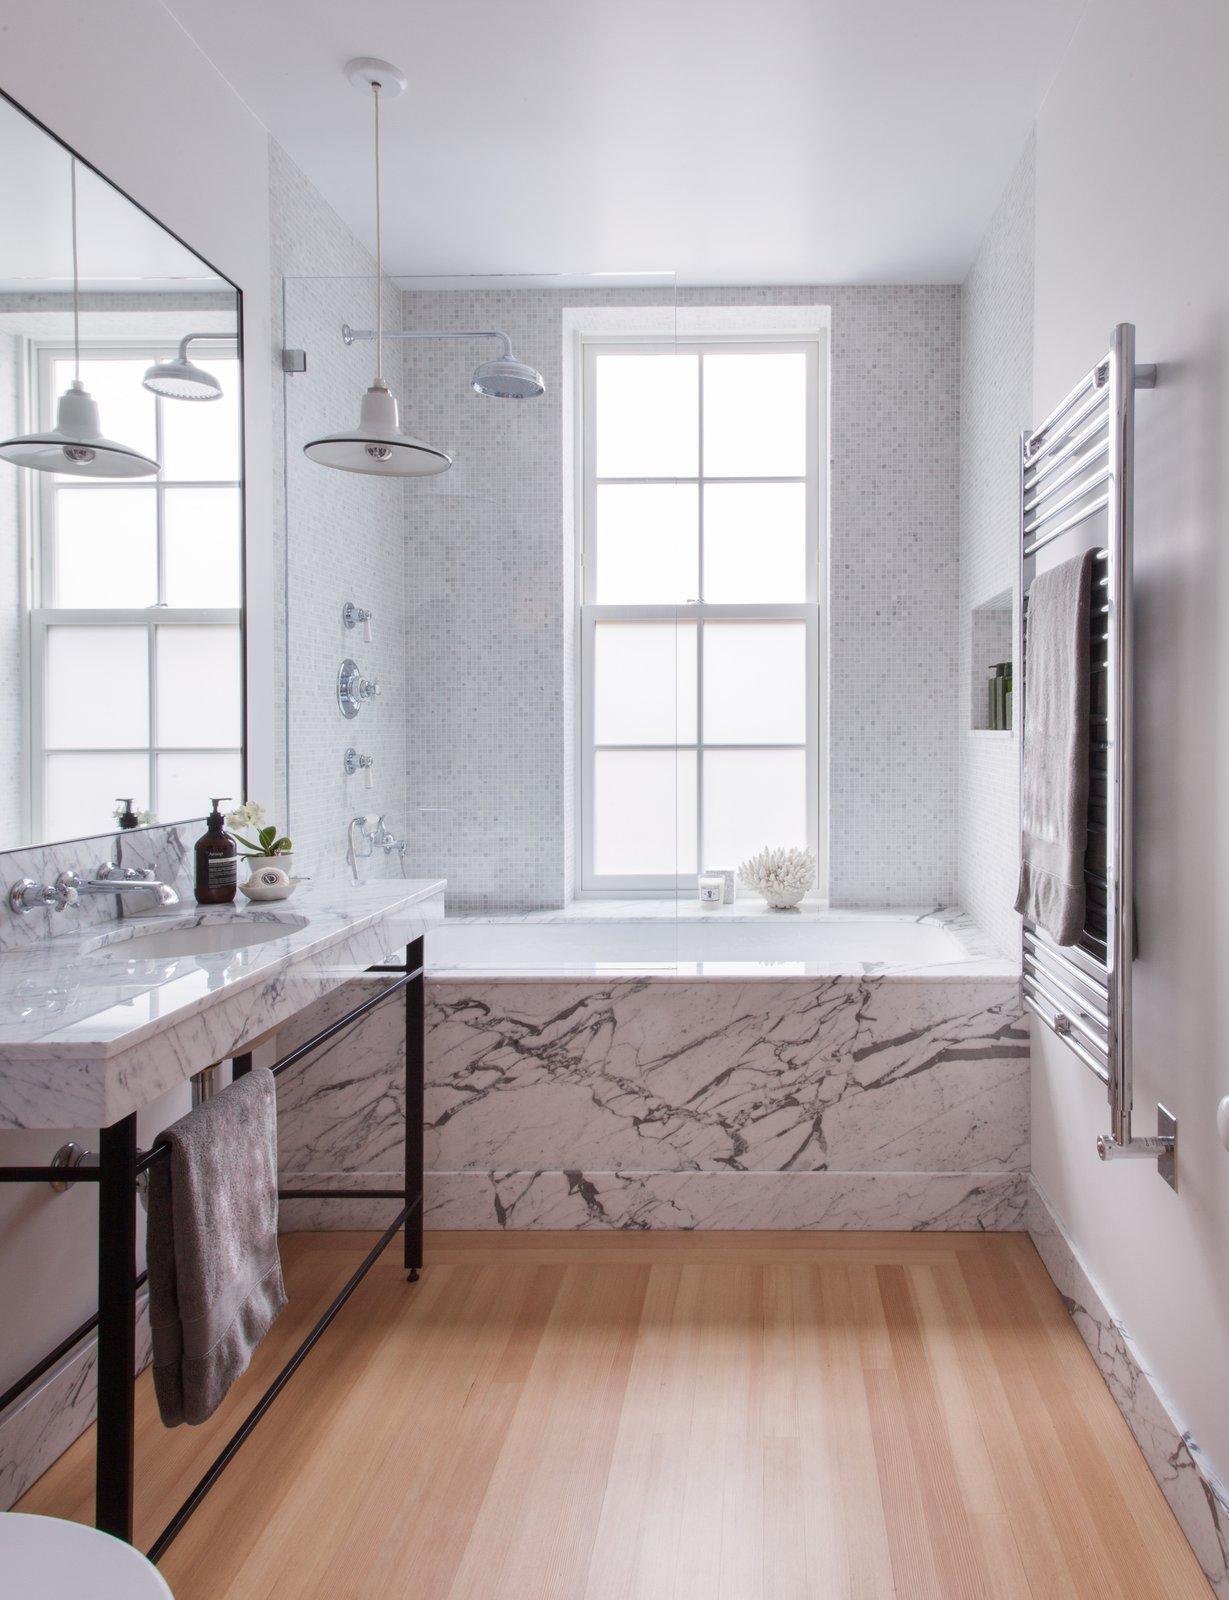 Bath Room, Marble Counter, Light Hardwood Floor, and Undermount Tub Clinton Hill Townhouse Renovation - Master Bath  Photo 4 of 7 in 7 Brooklyn Row Houses Renovations from Clinton Hill Townhouse